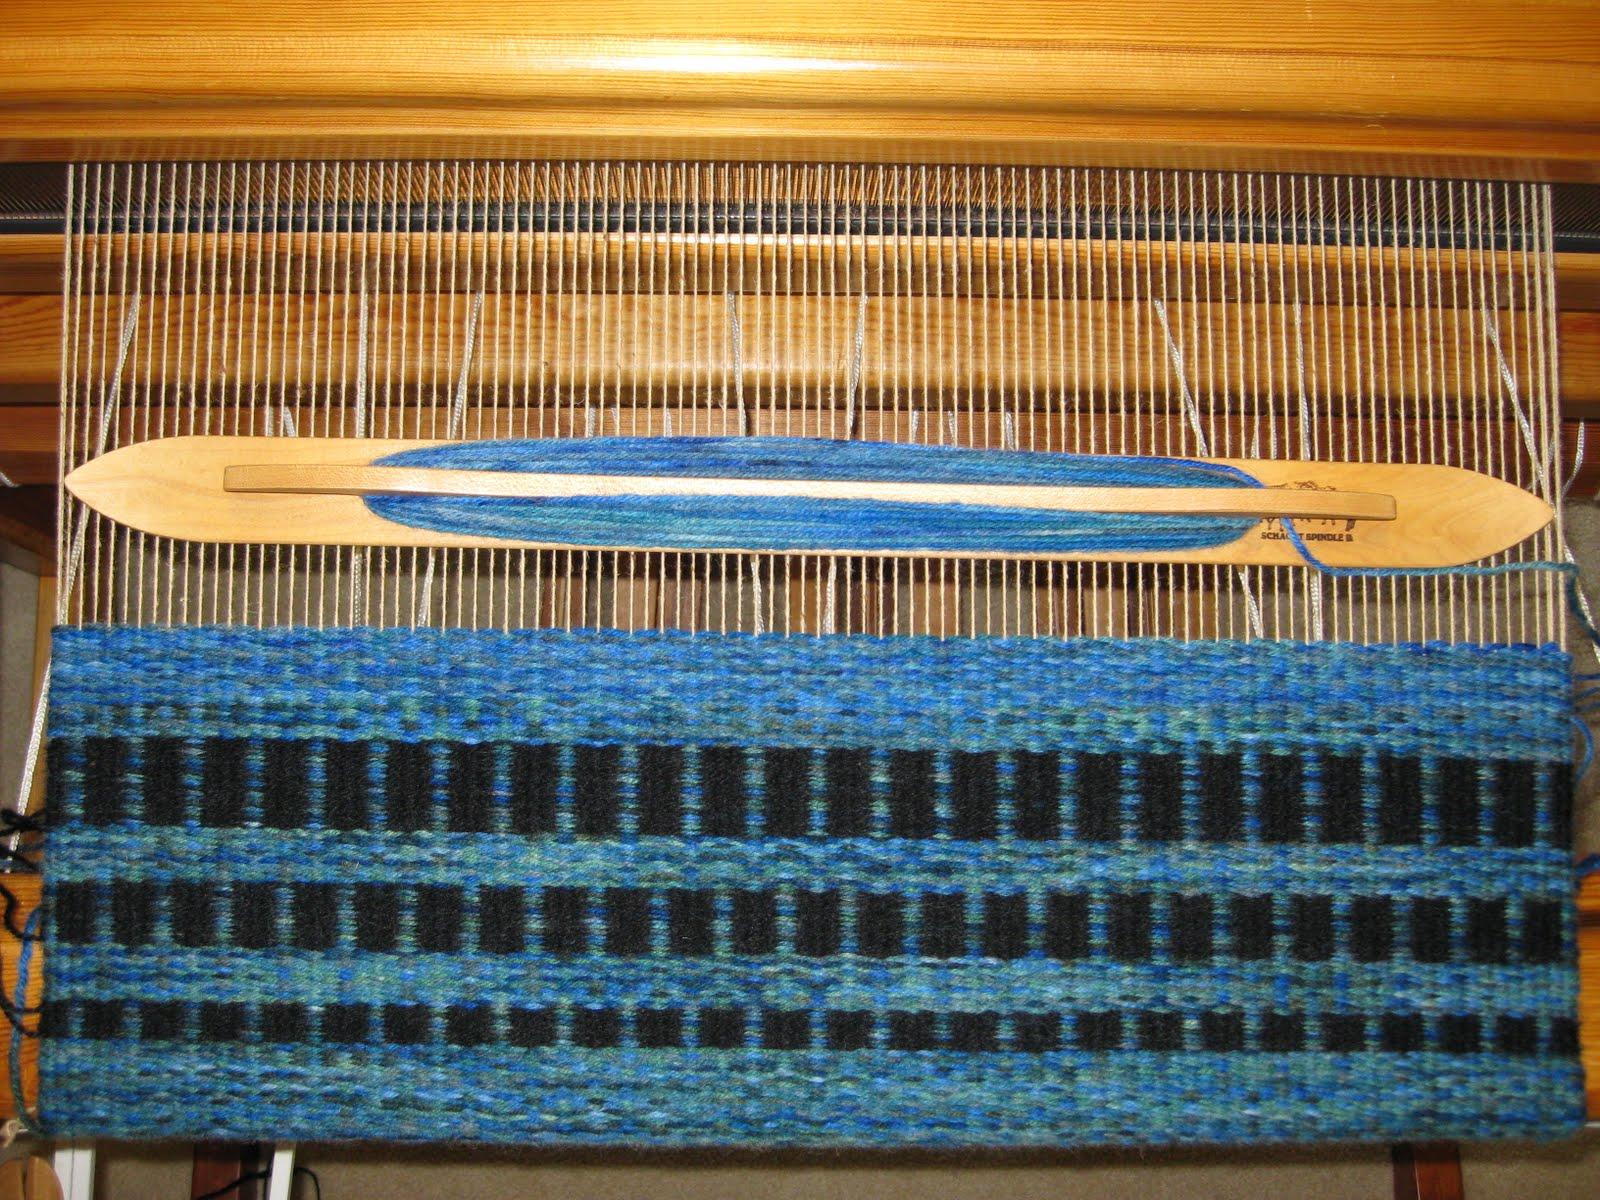 Navajo Rug Weaving and Design - Indiana Watson's Indian Weaving